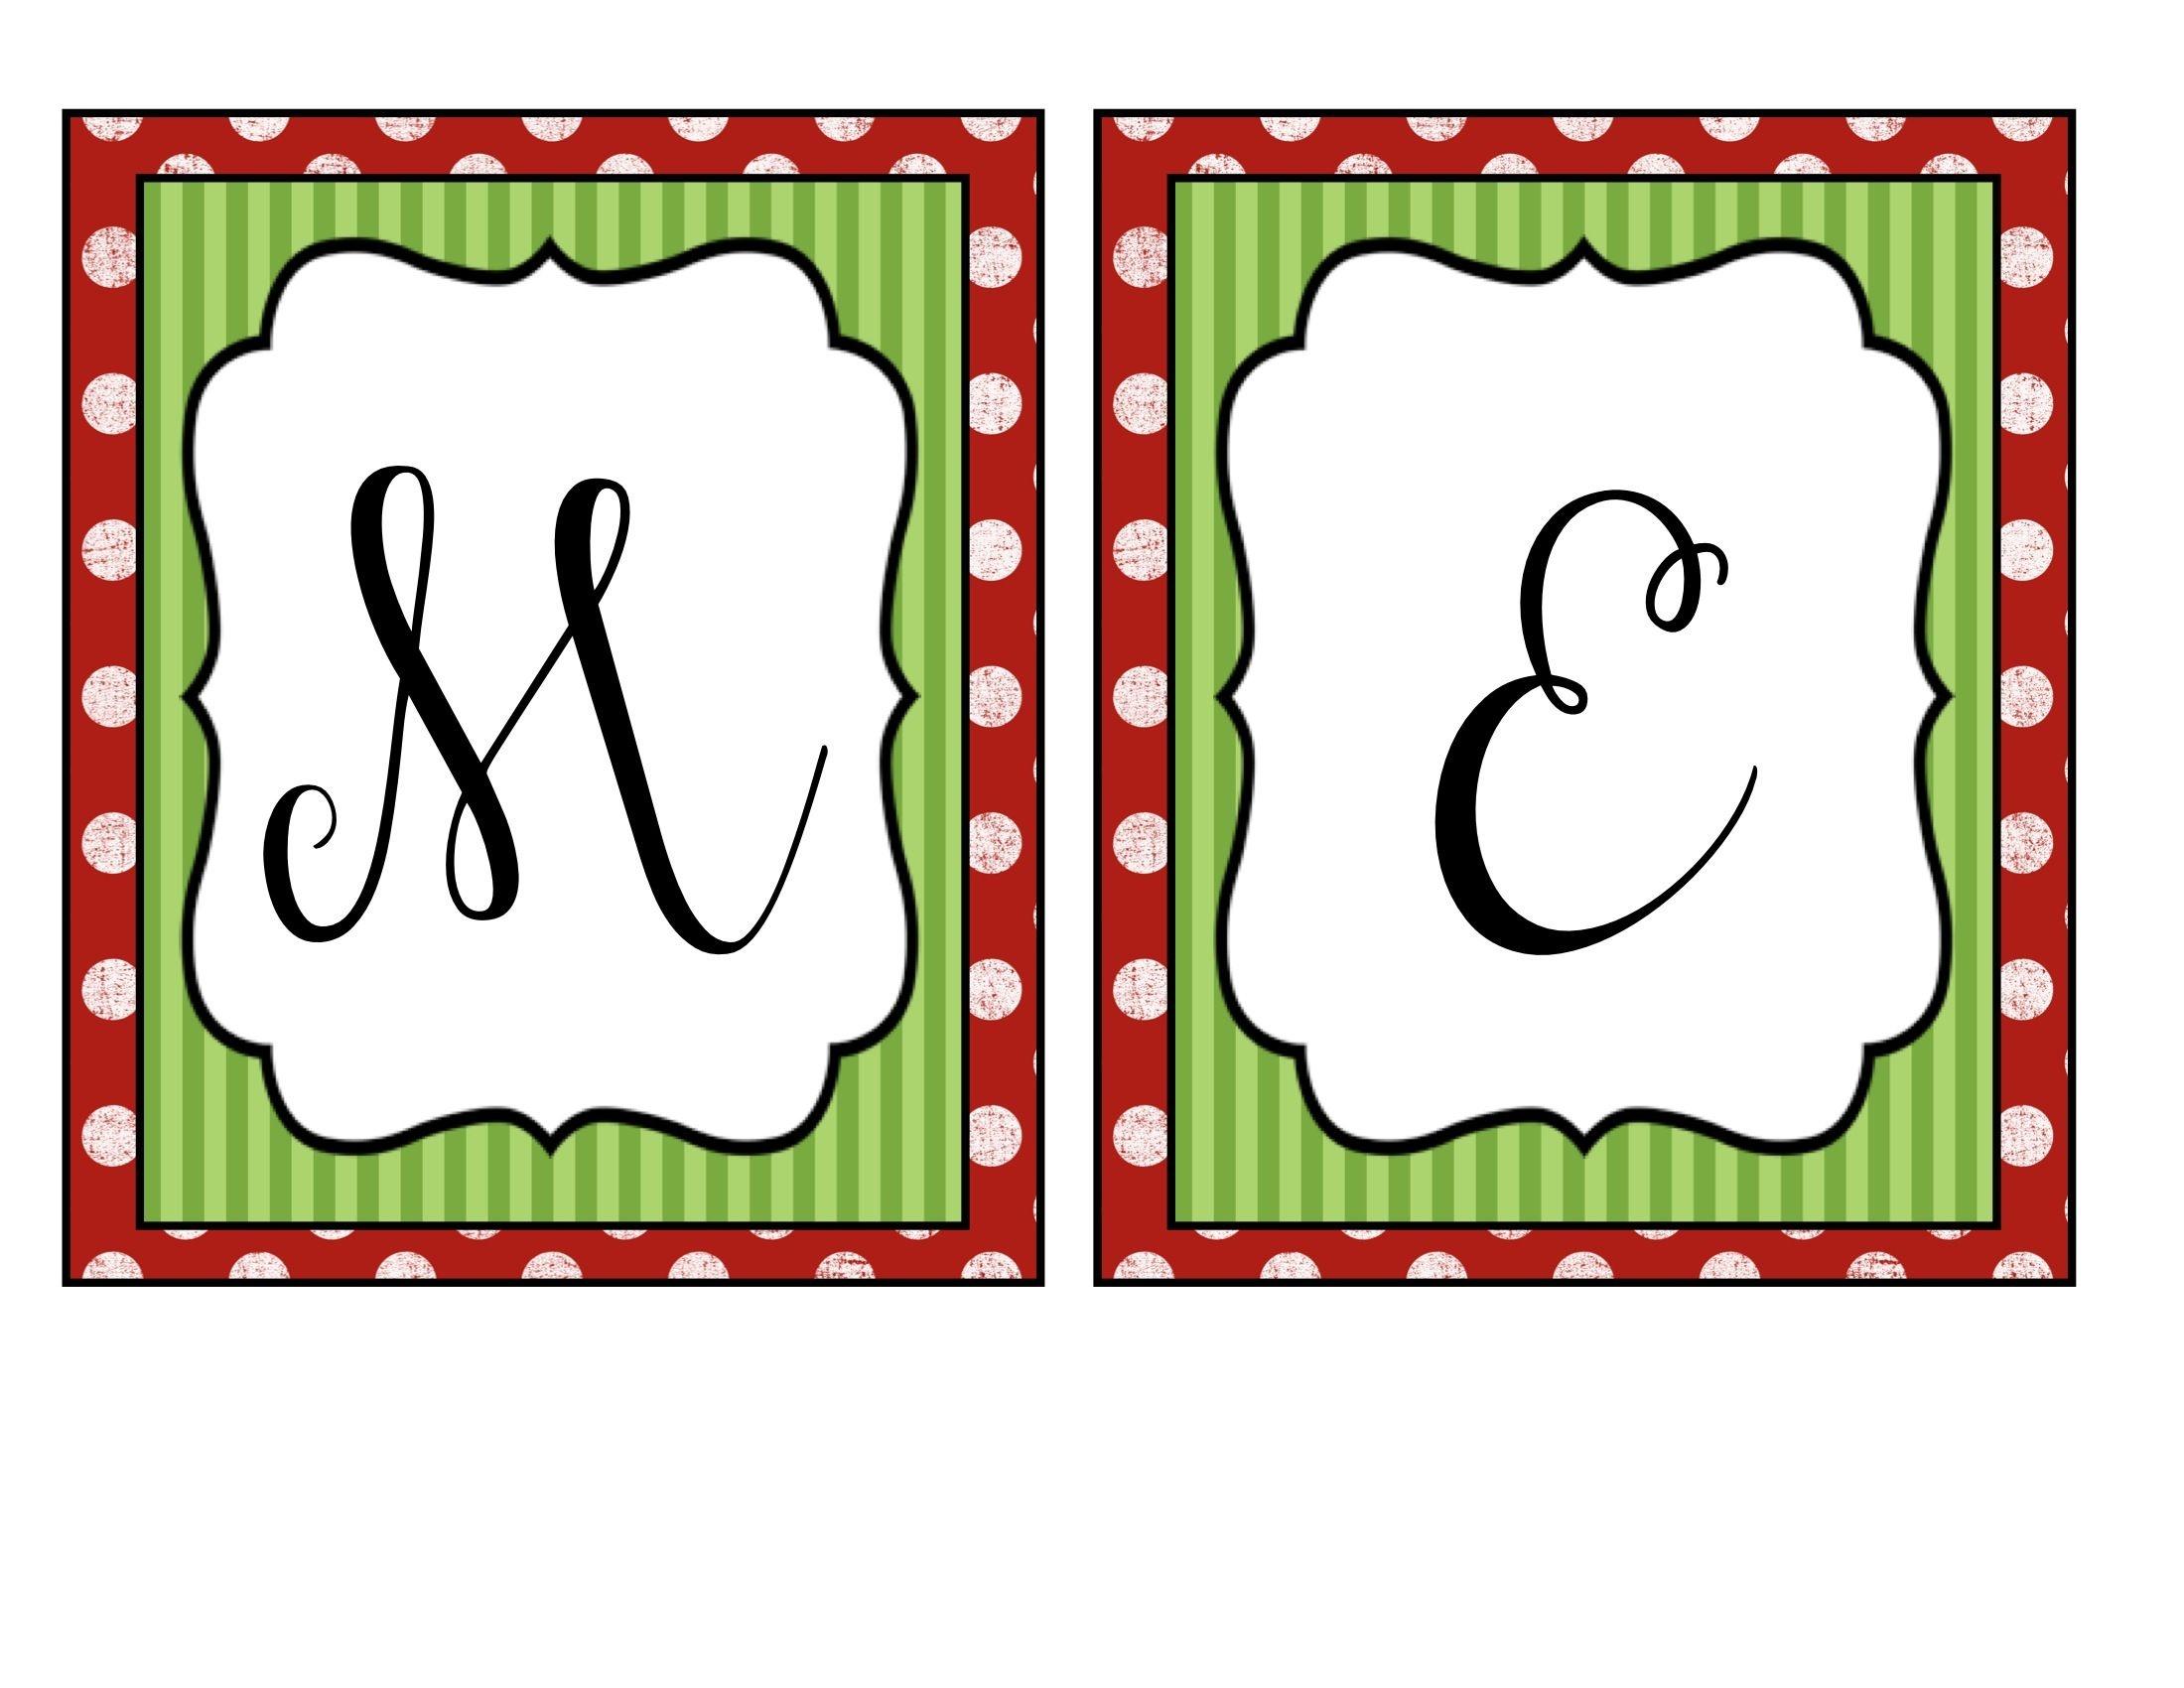 Merry Christmas Banner | Holidays | Christmas Banners, Merry - Free Printable Christmas Letters